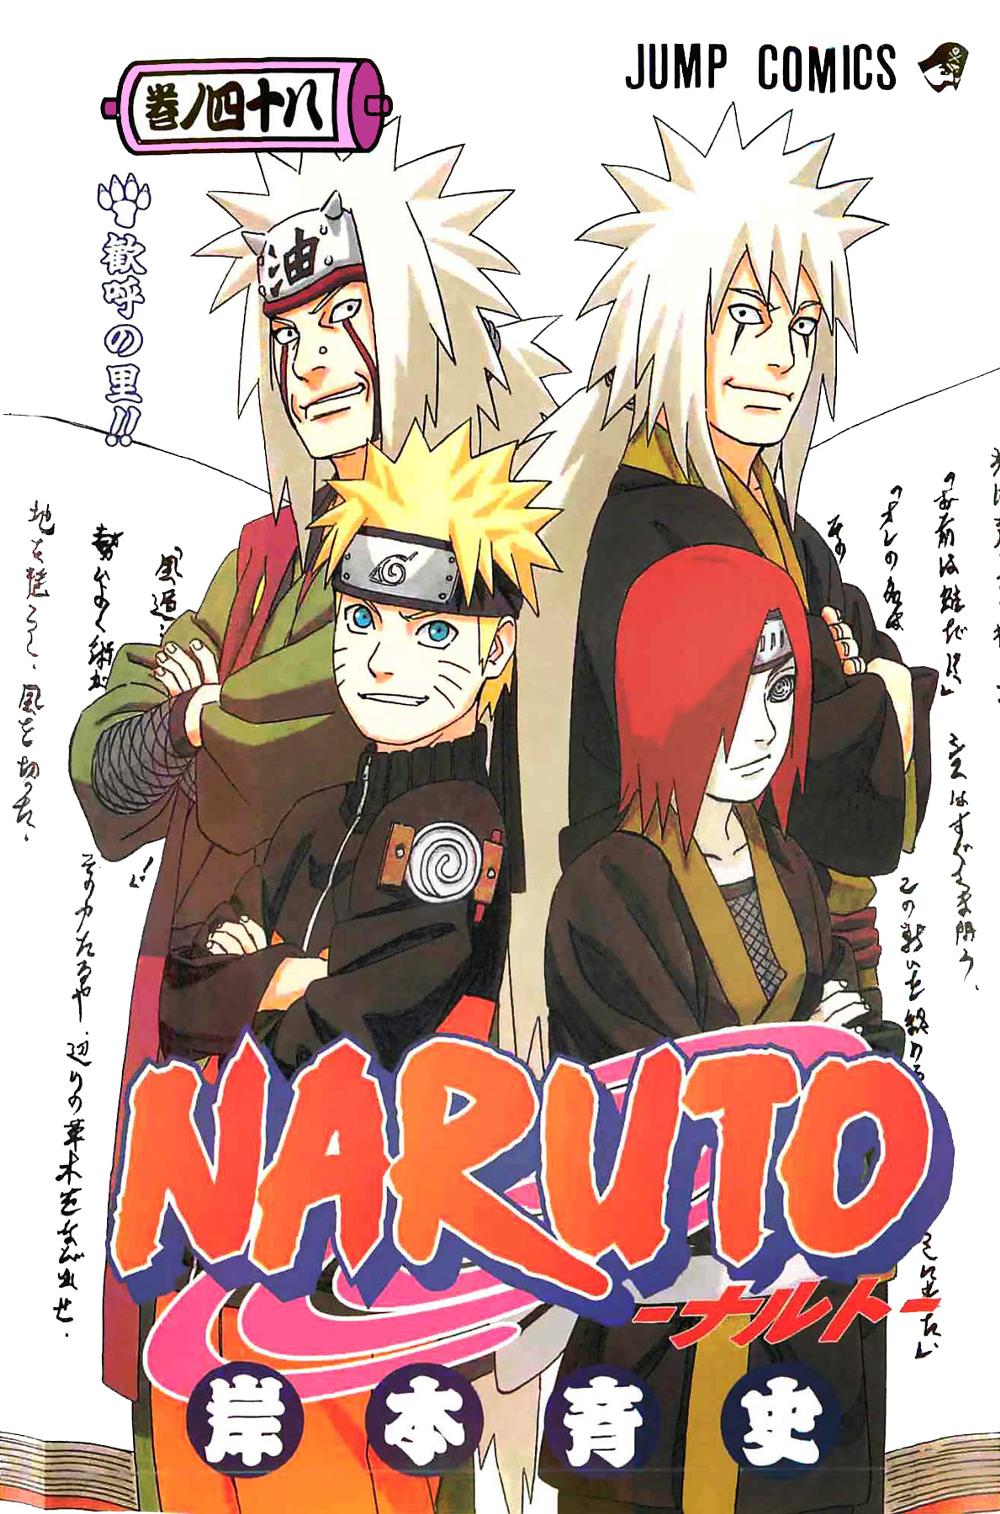 Naruto 48 The Joyous Village!! / Masashi Kishimoto